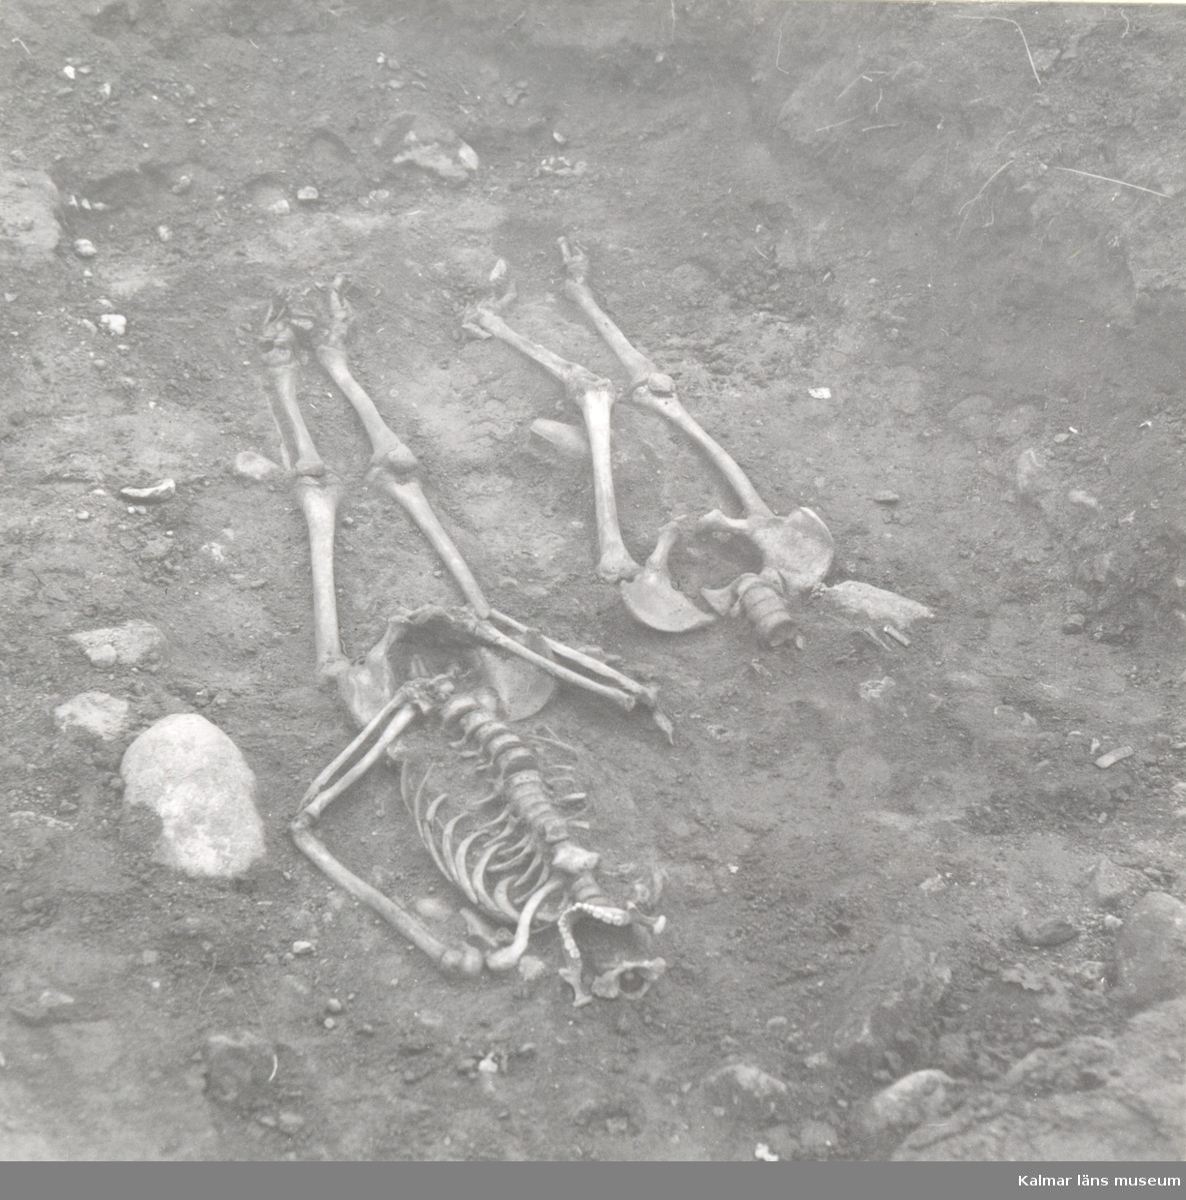 Skelett, foto från SV. Foto:Gunnel Forsberg oktober 1965.